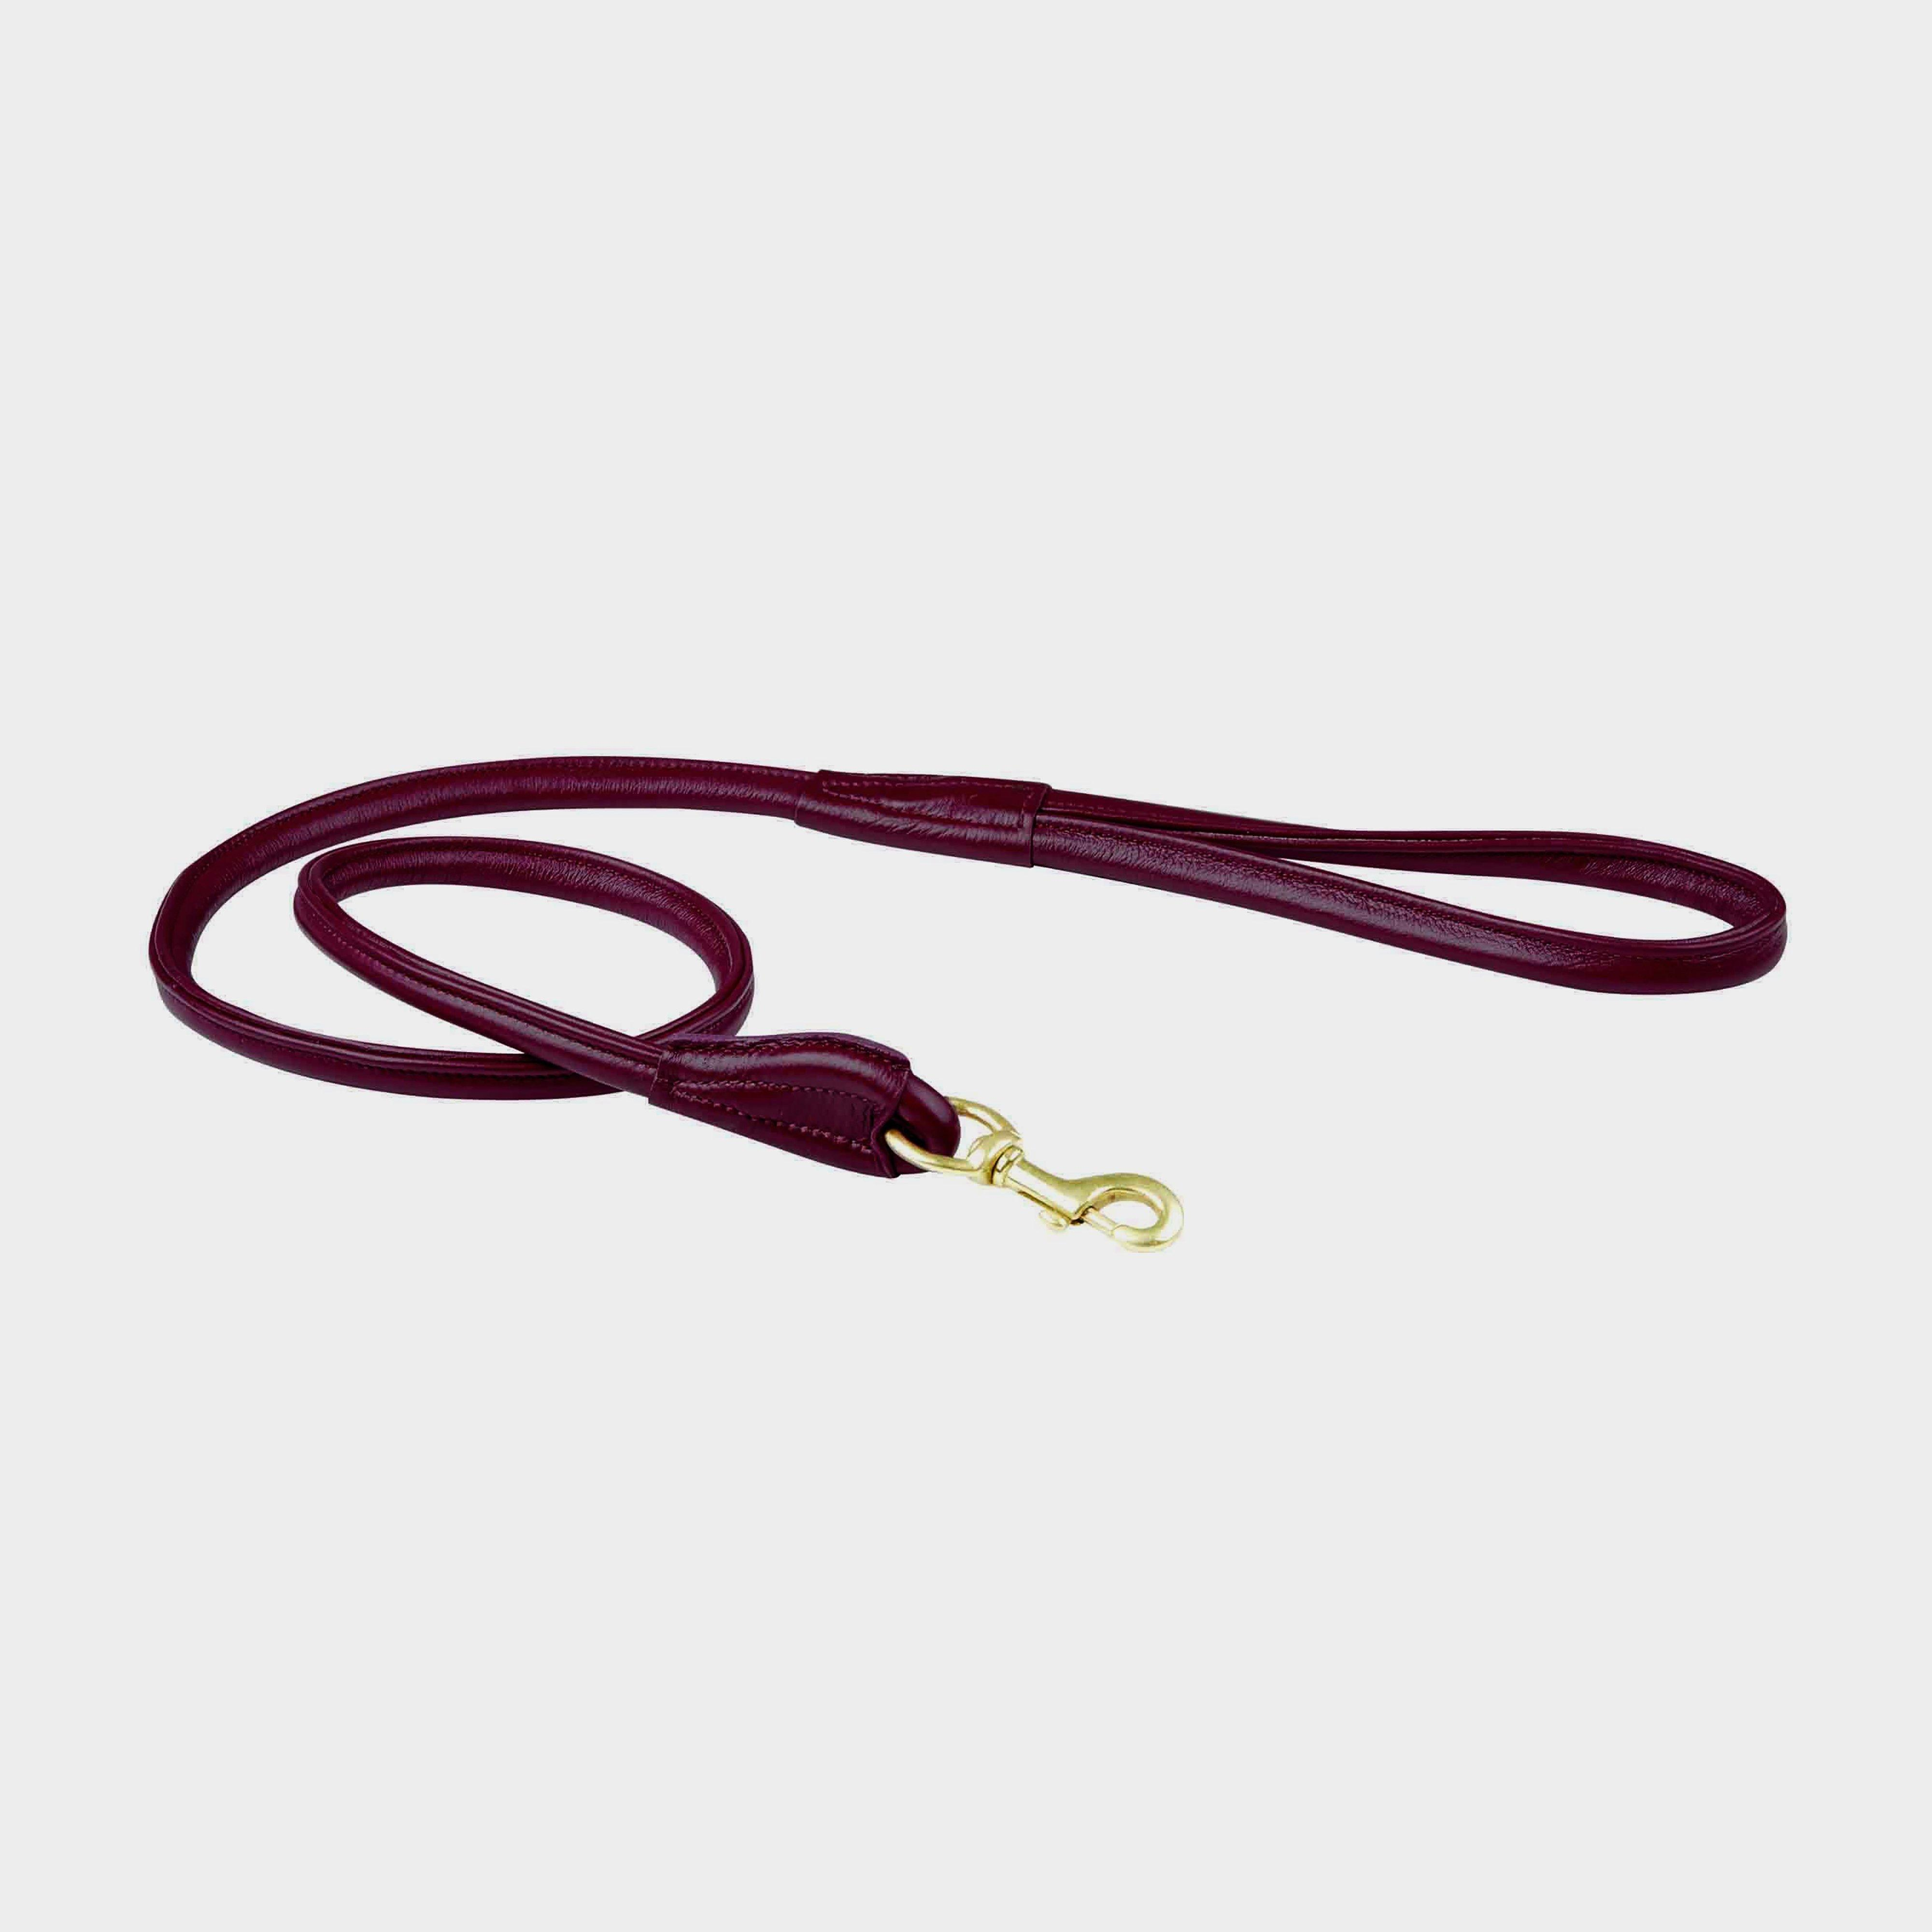 Image of Weatherbeeta Rolled Leather Dog Lead - Purple/Purple, Purple/Purple